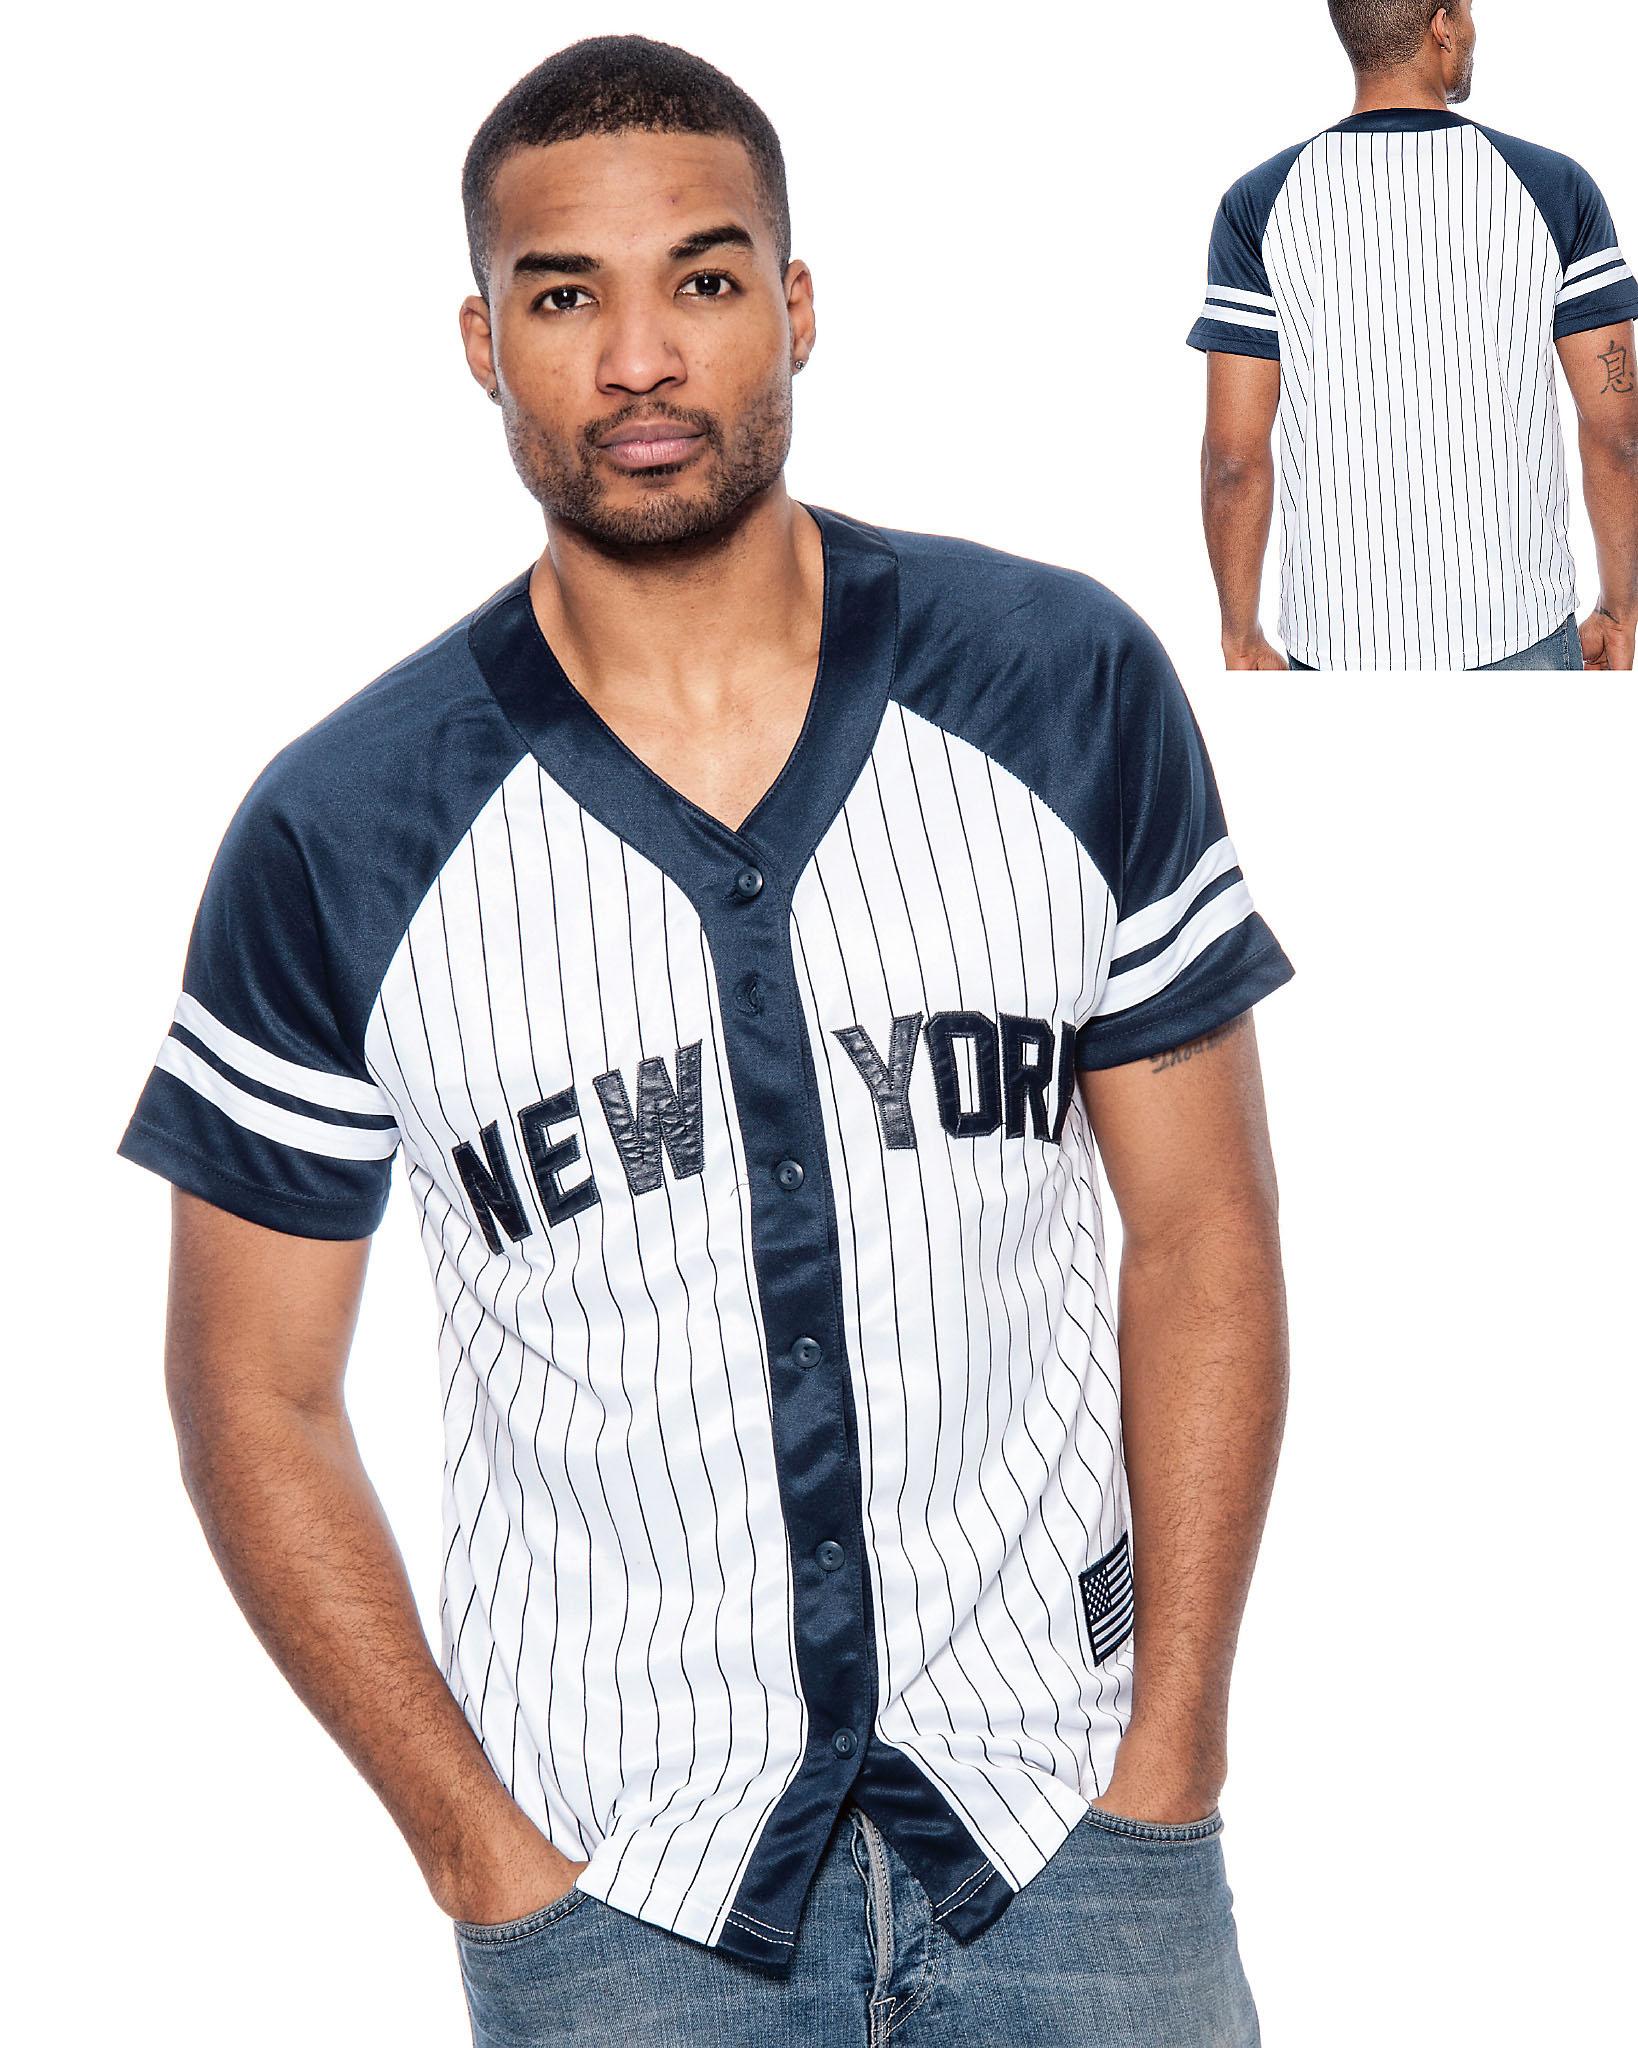 True-Rock-Men-039-s-New-York-Pinstripe-Baseball-Jersey